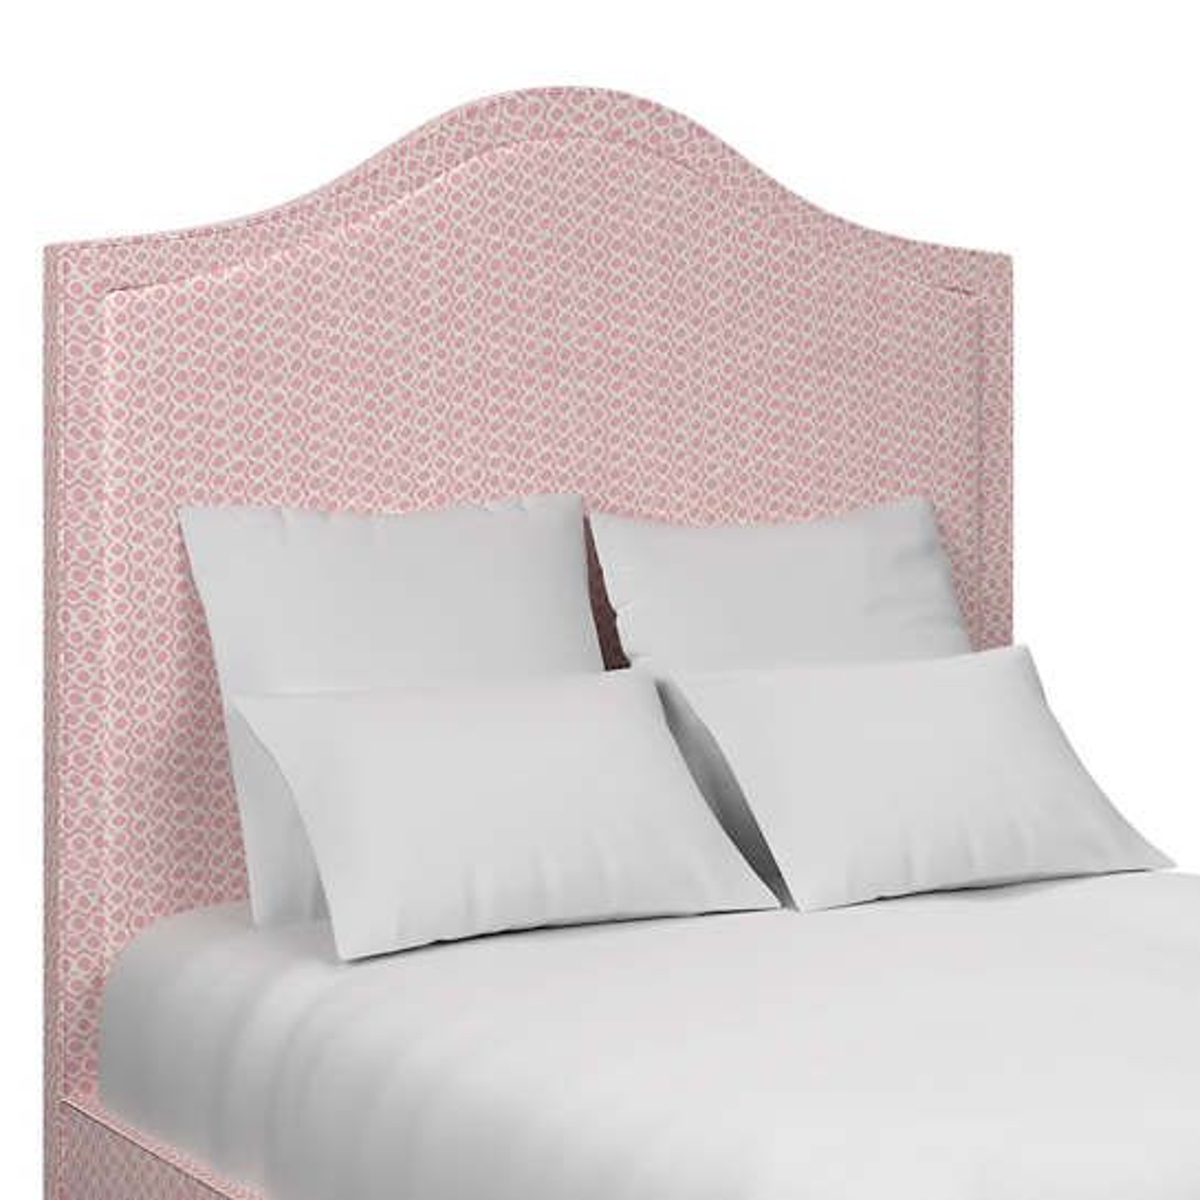 Beads Pink Westport Headboard